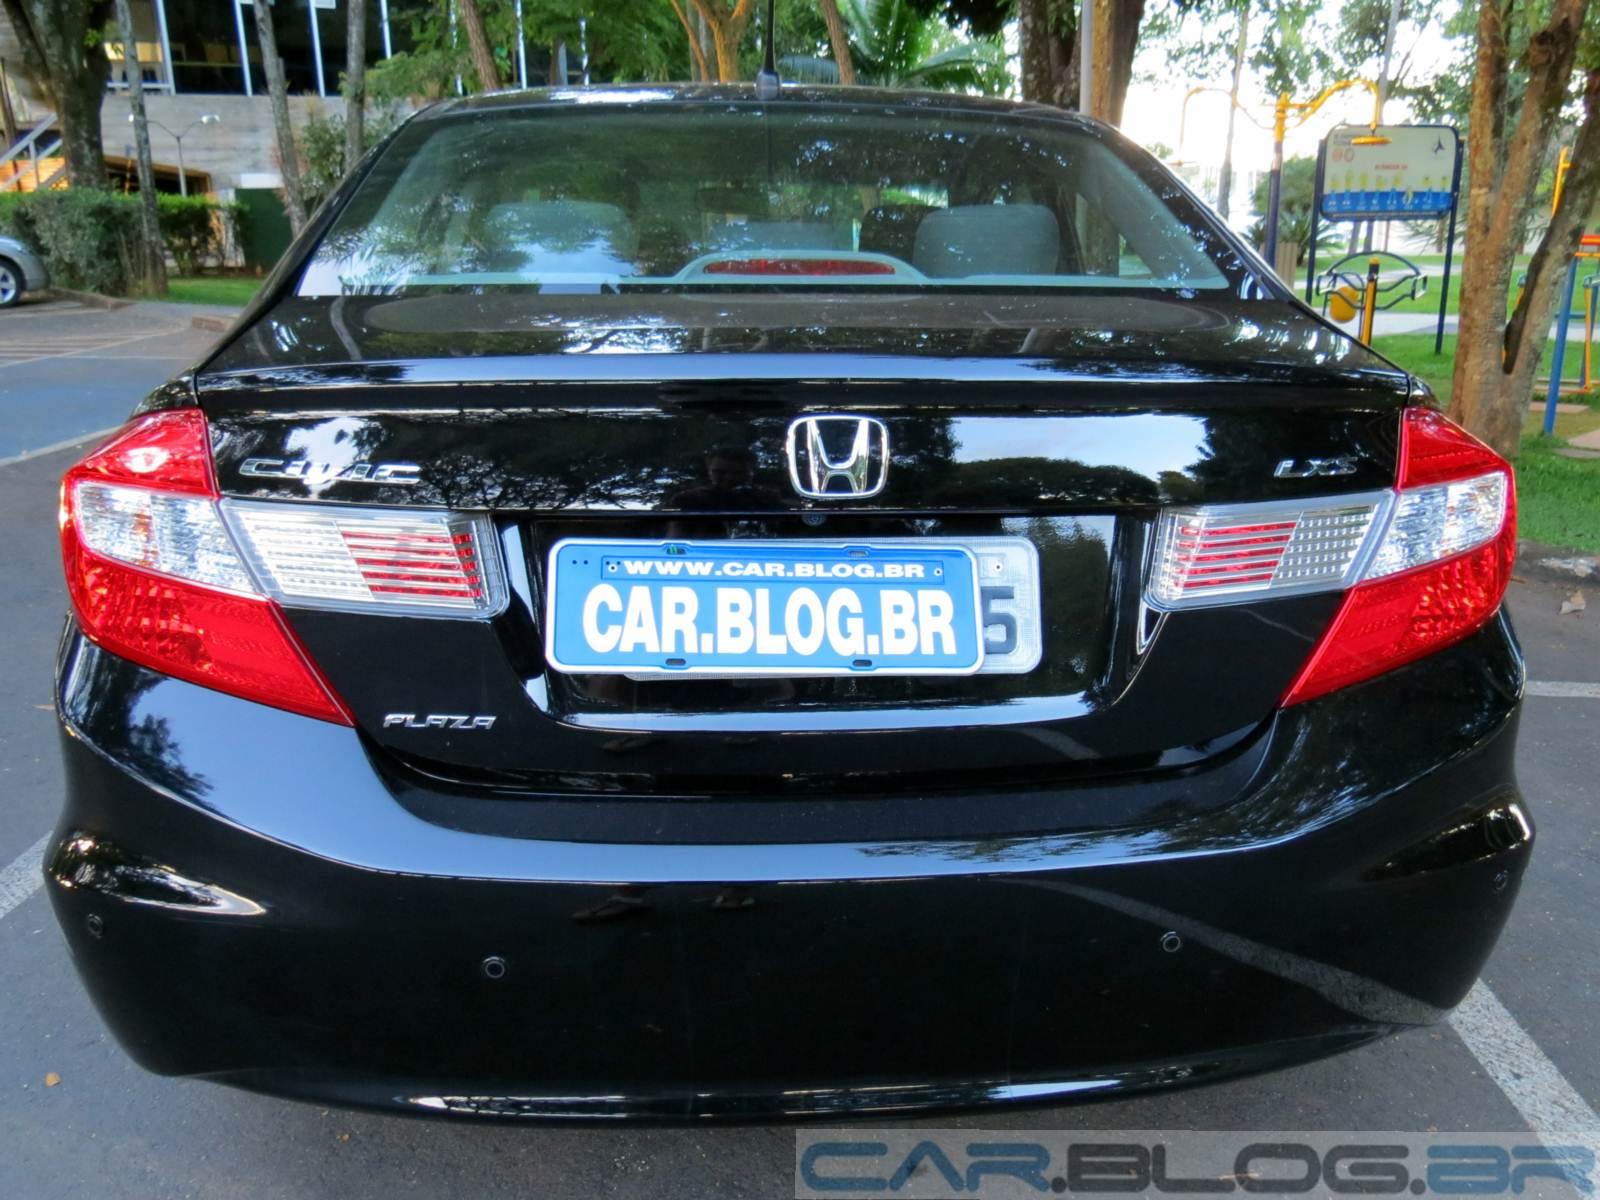 honda civic lxs 2012 manual pre o consumo fotos e e rh car blog br manual do civic 2012 lxl manual do civic 2012 lxl